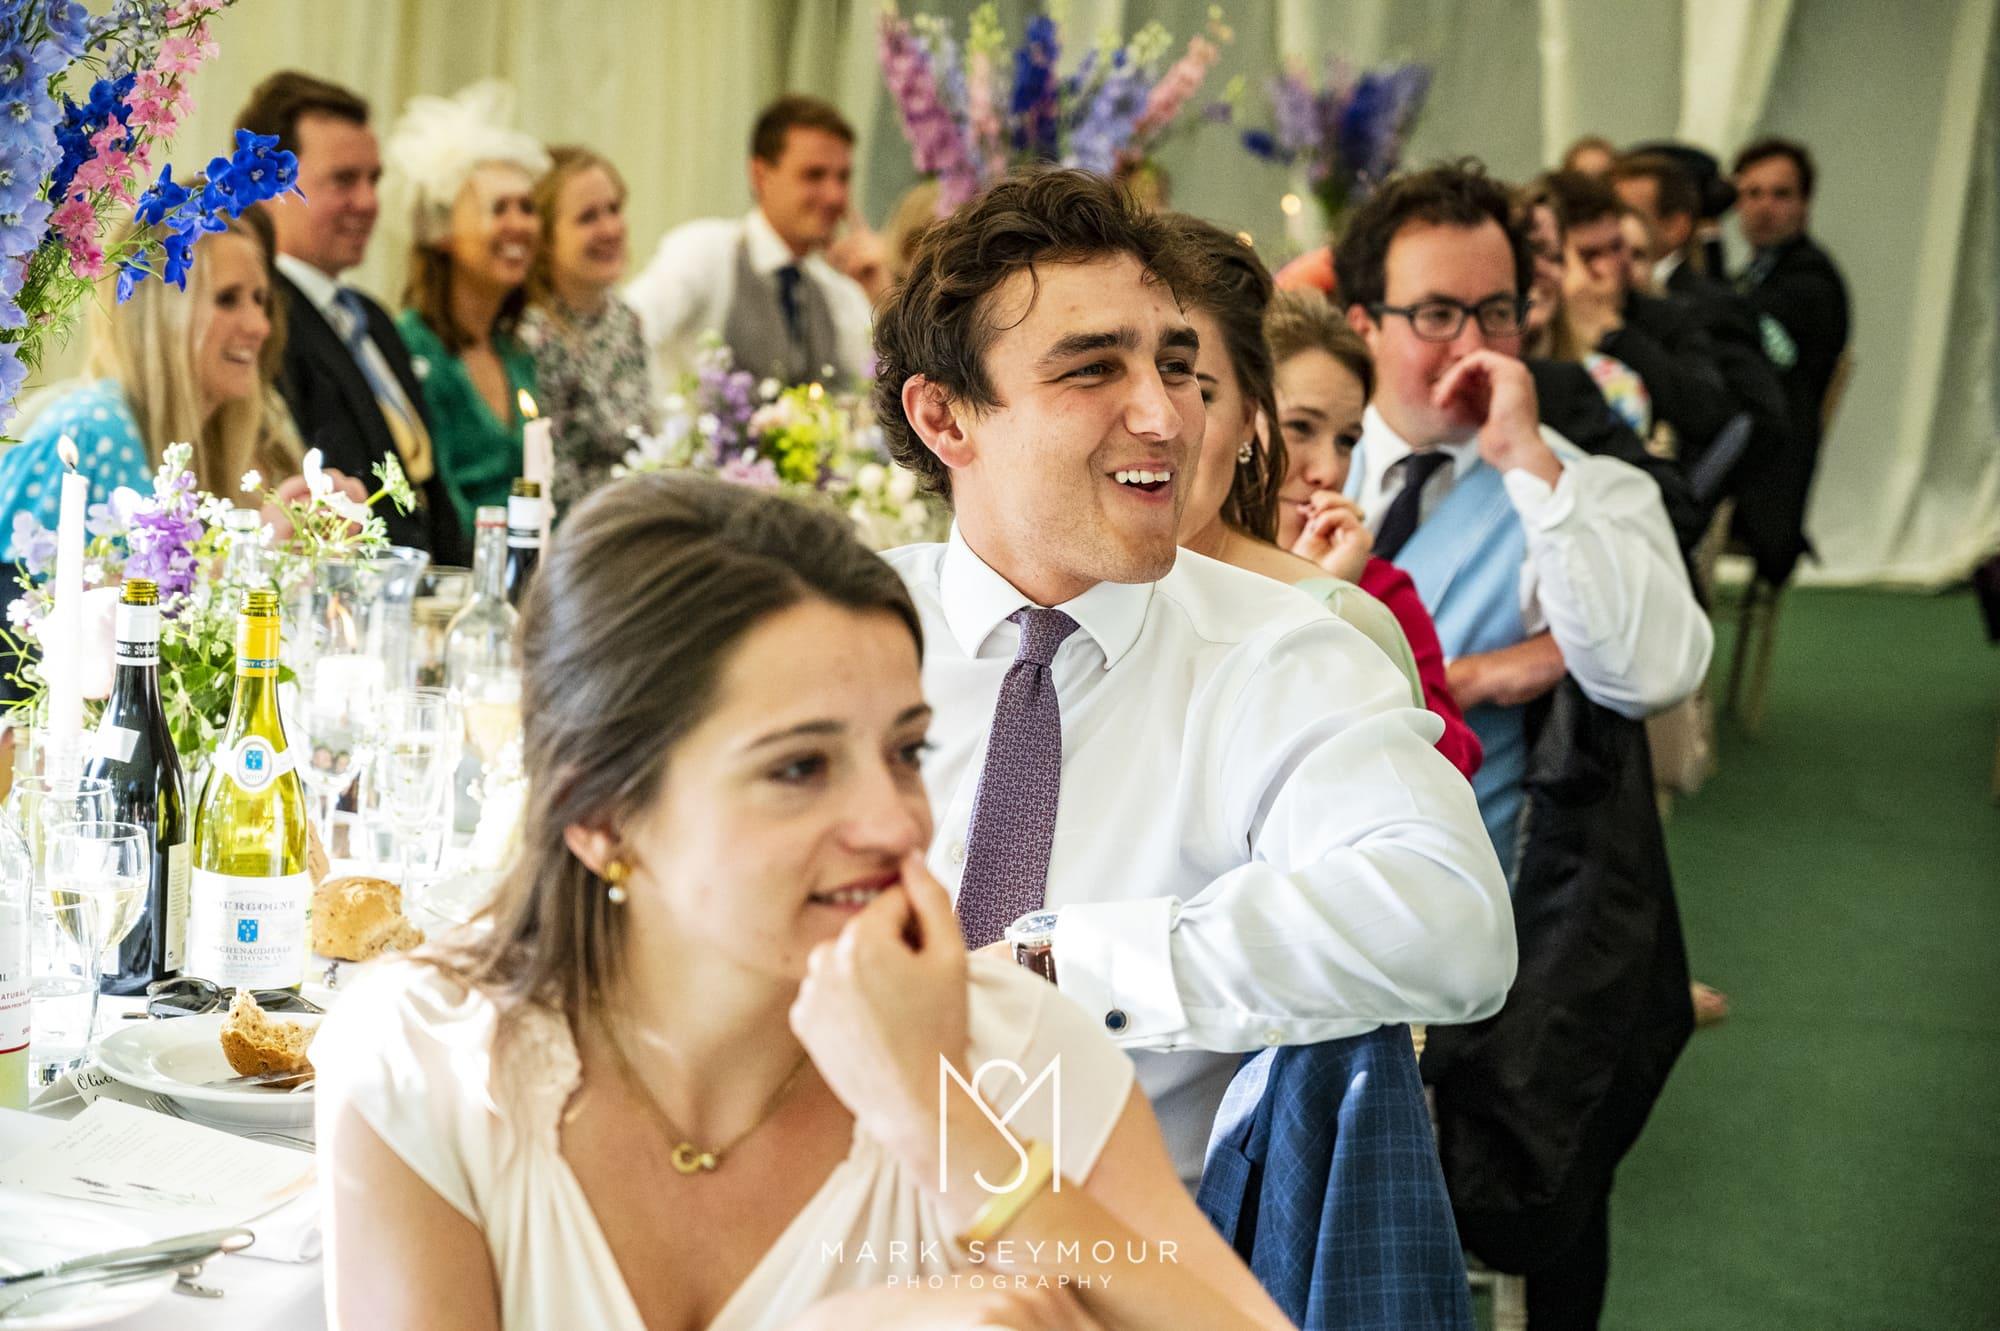 Blenheim Palace Wedding Photographer 40